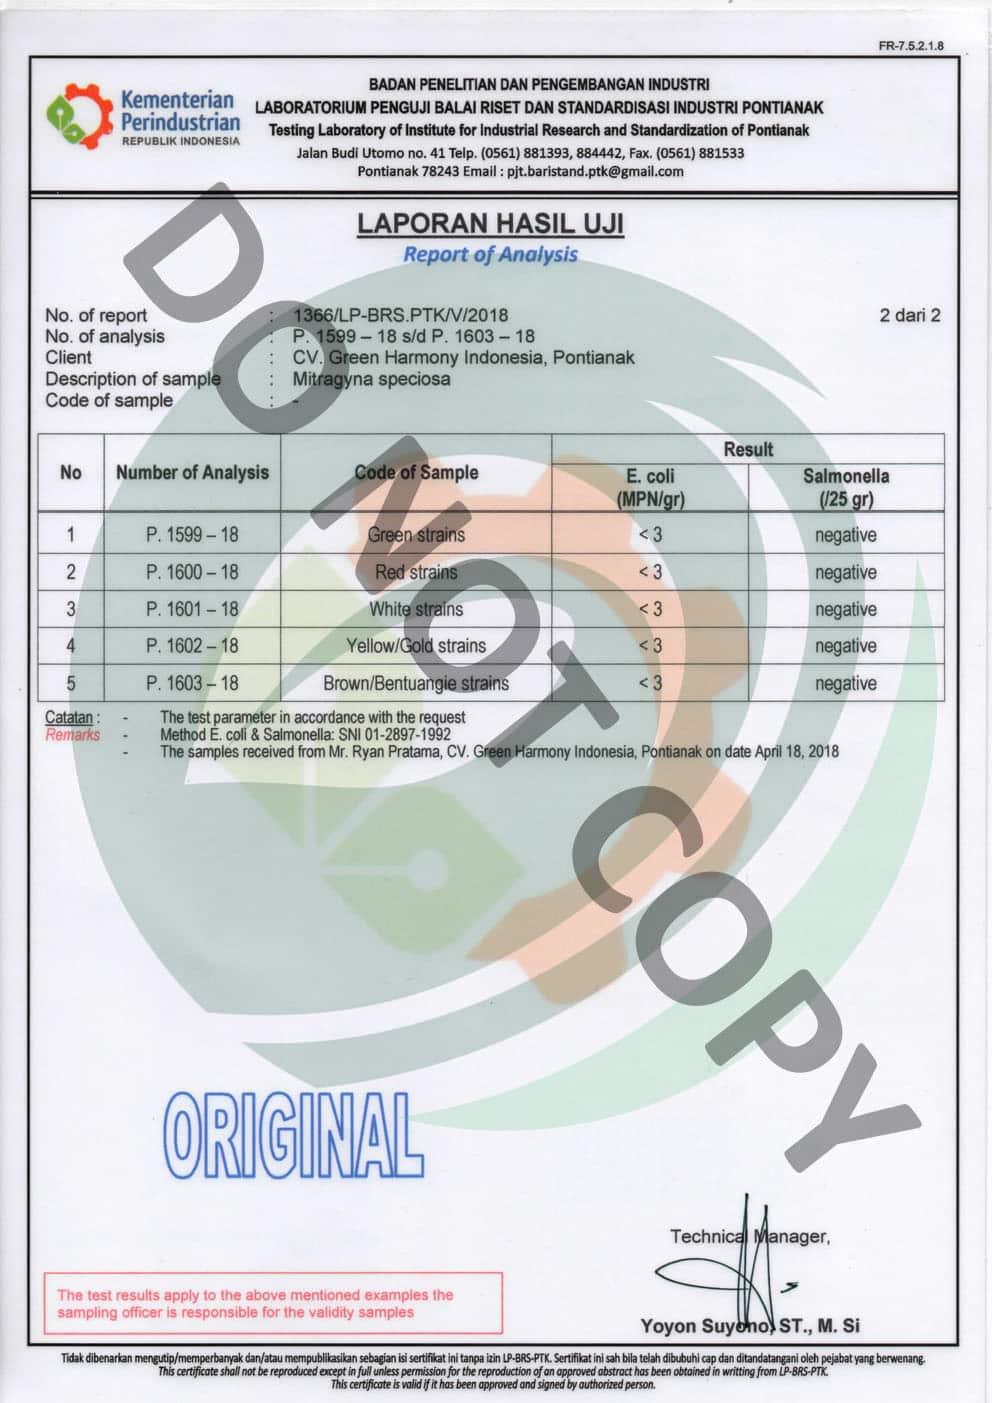 Lab Tested Kratom Powder - Green Harmony Indonesia Kratom Vendor - kratom vendors that lab tested kratom